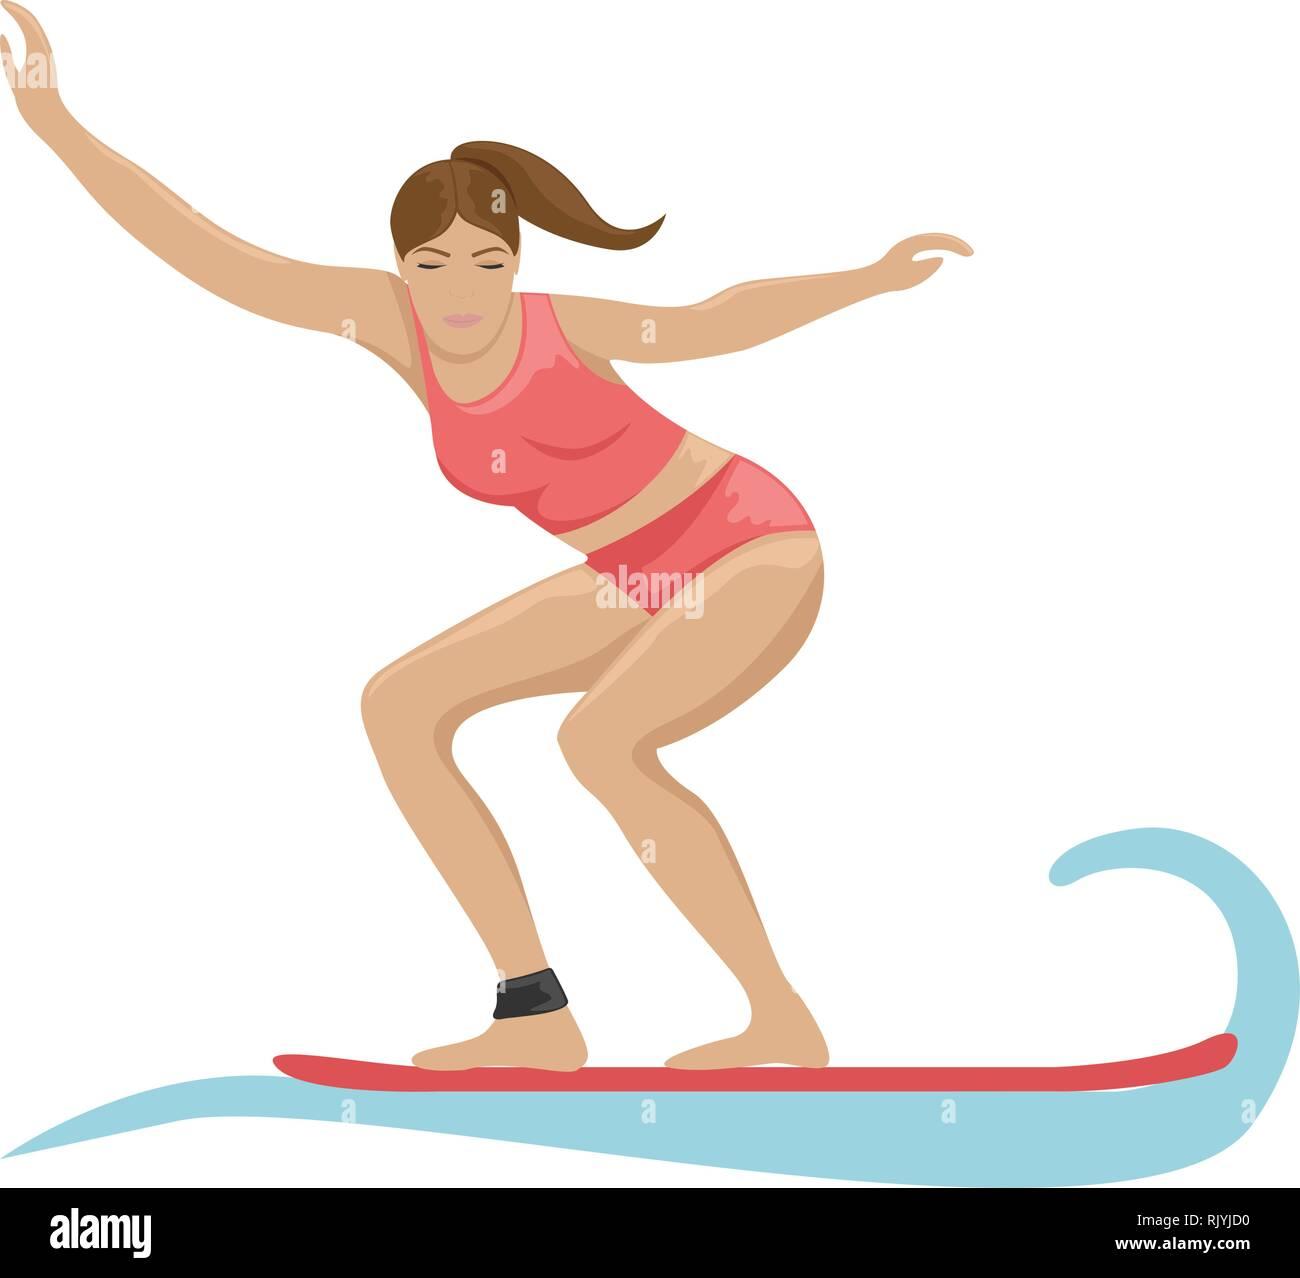 Summer activity. Girl surfing on the waves. Flat vector illustration. - Stock Vector